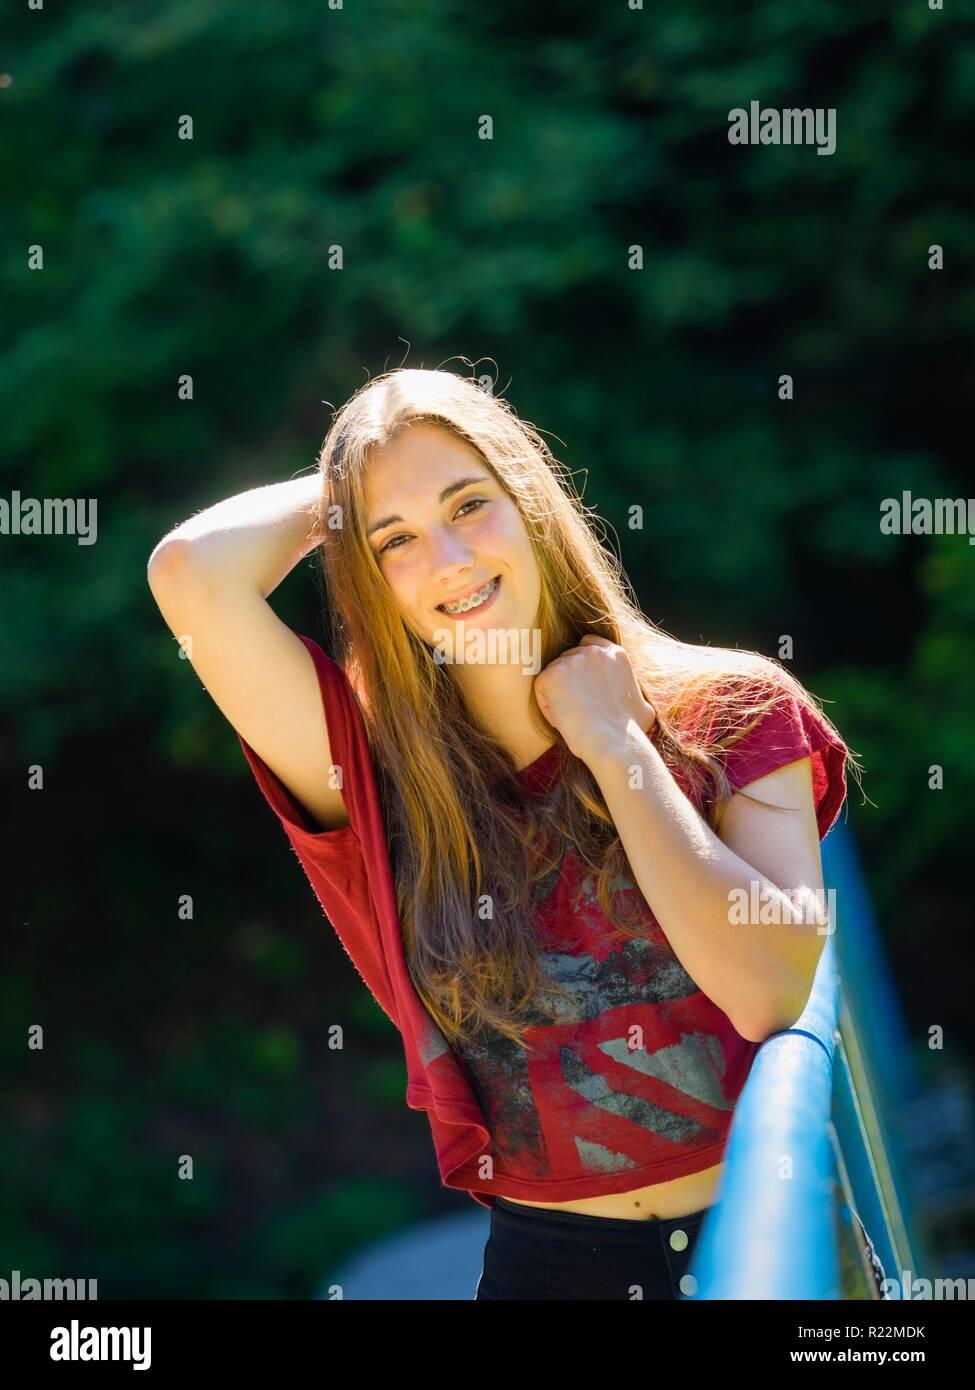 Les renforts des dents young teen femme yeux-contact smiling at camera Banque D'Images